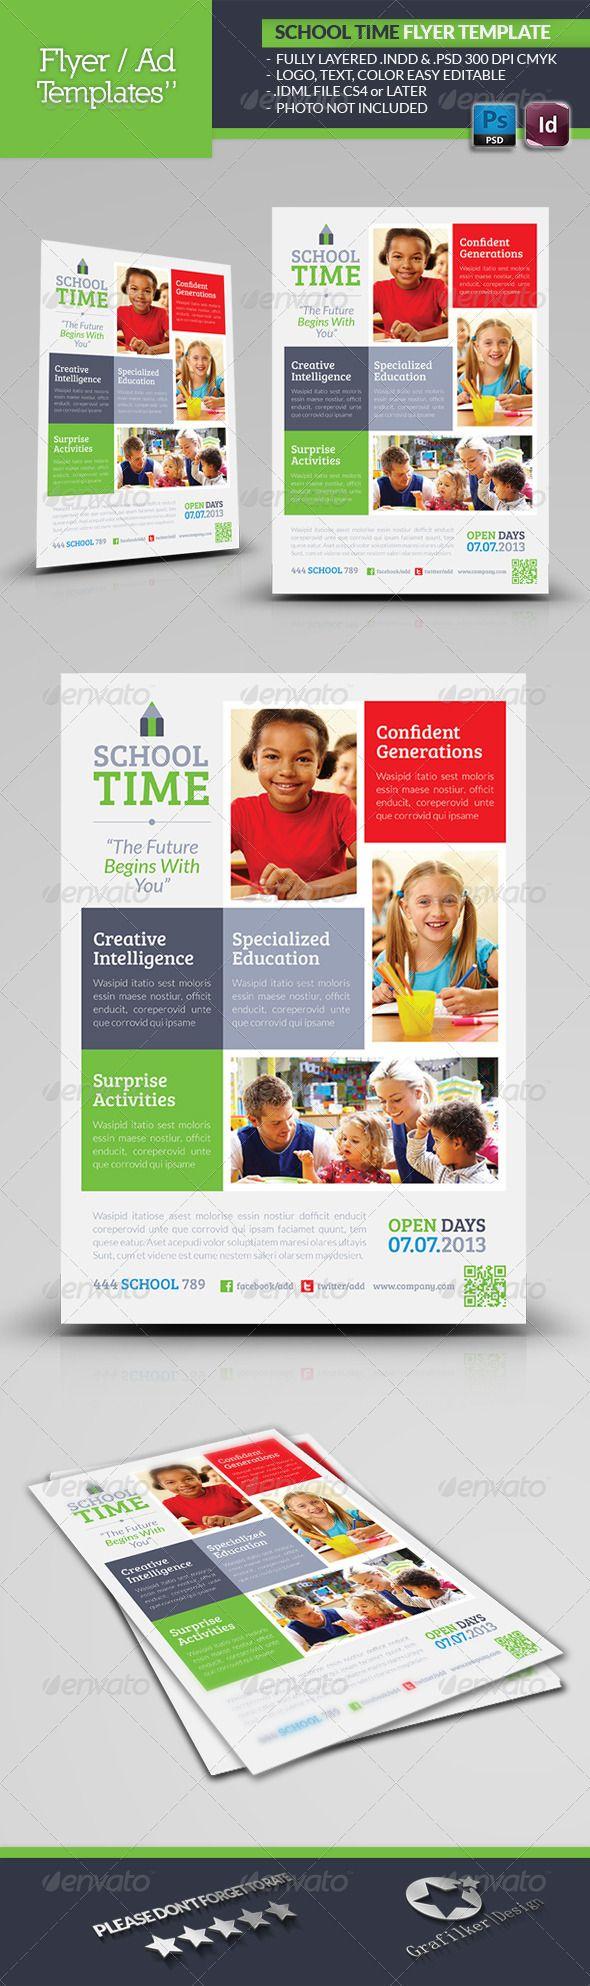 best ideas about school marketing acrylics school time flyer template